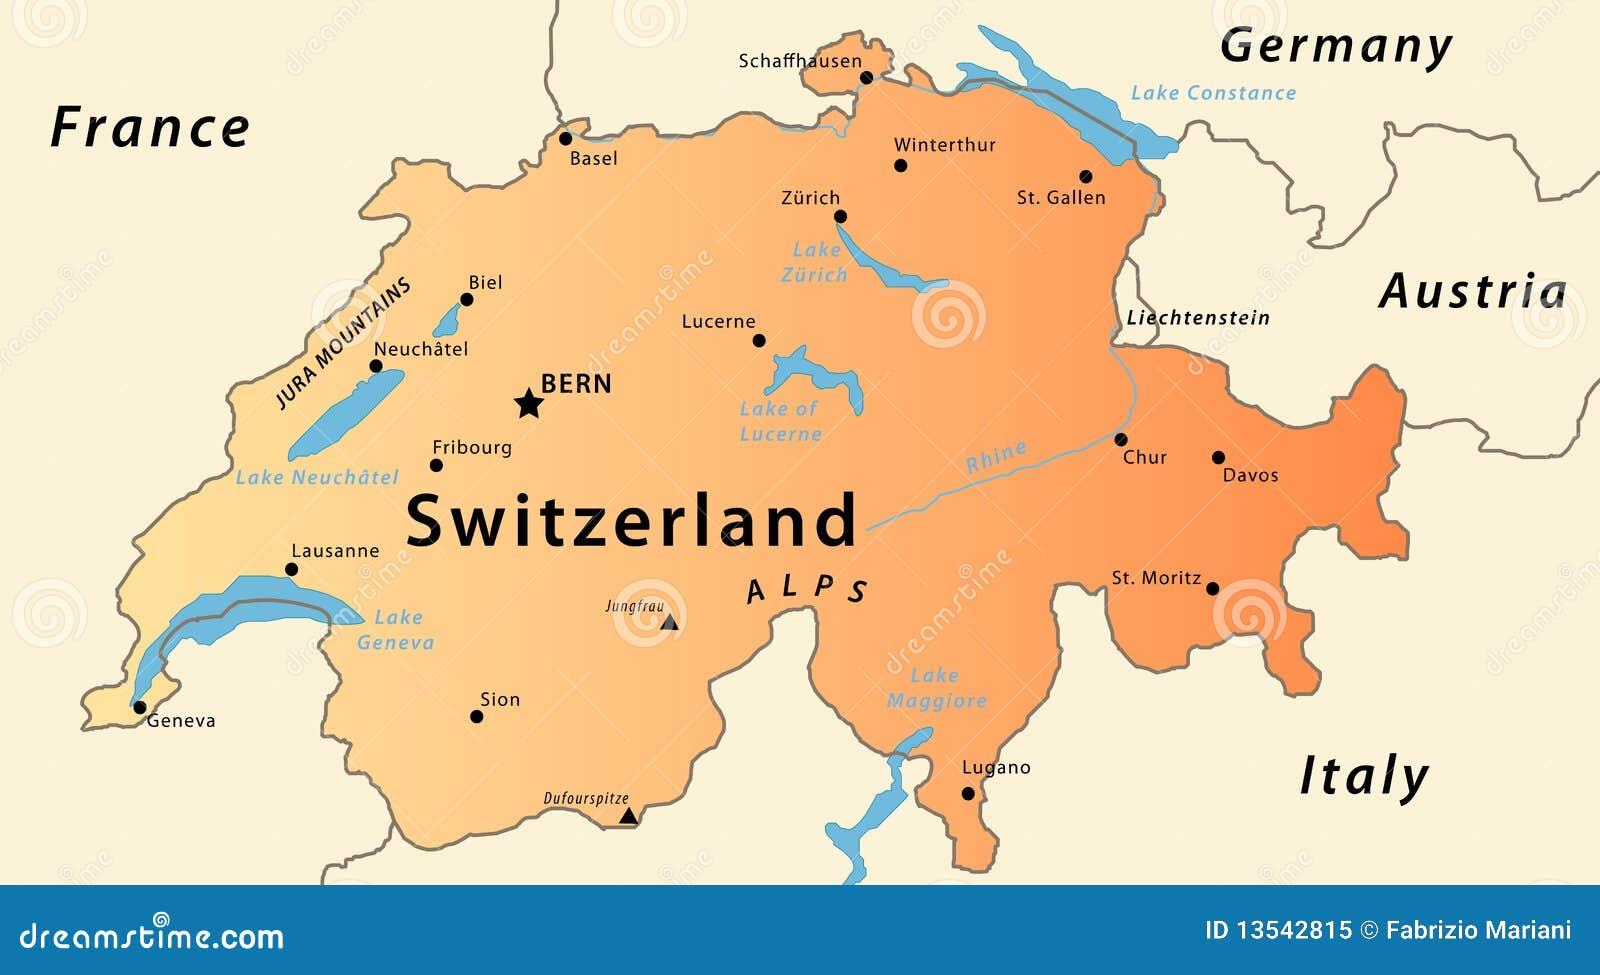 Switzerland map stock vector. Illustration of confederation ...